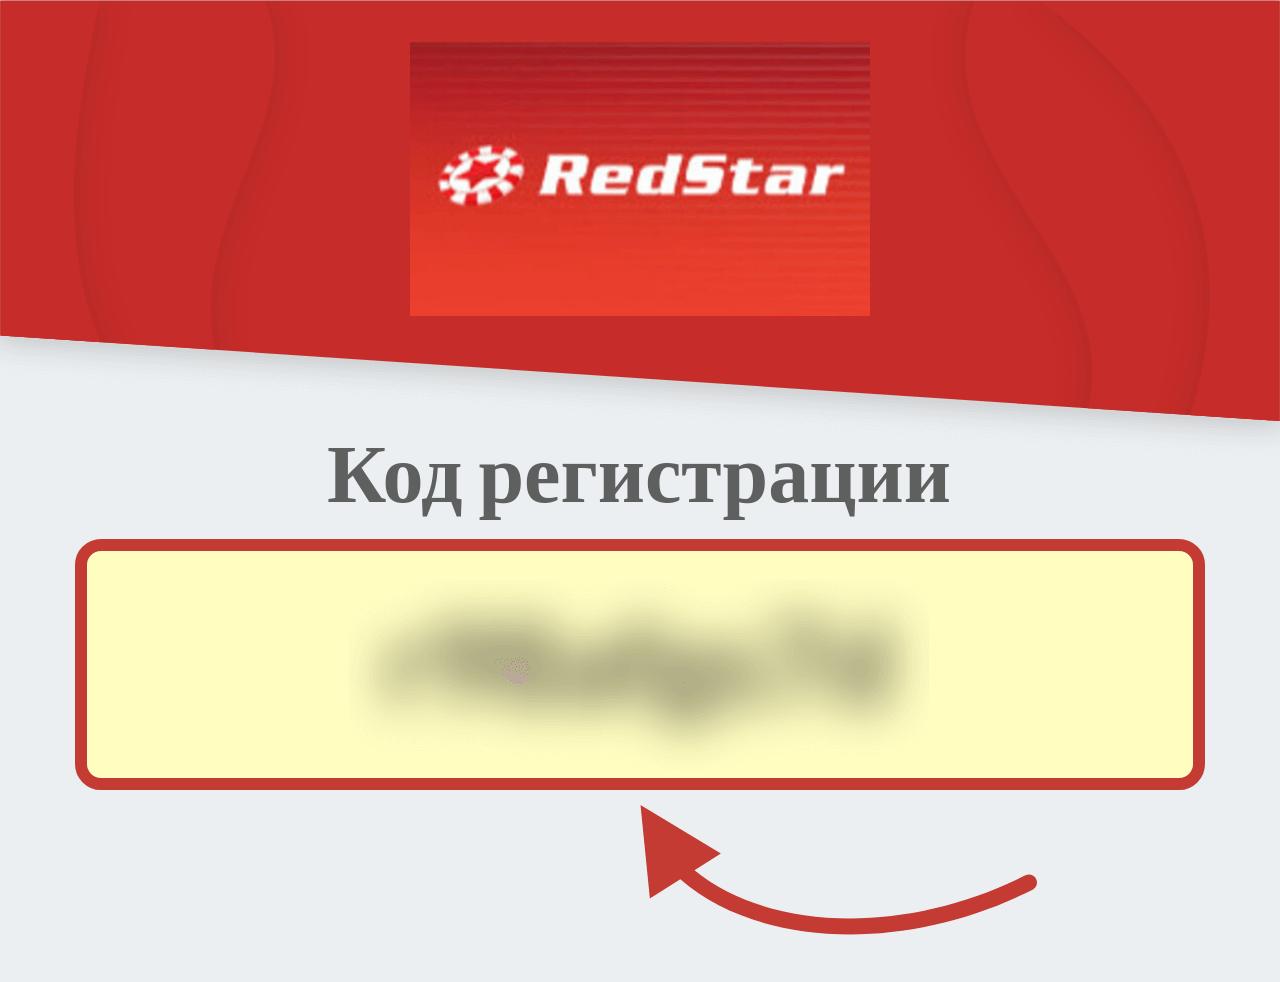 Red Star Casino Код регистрации